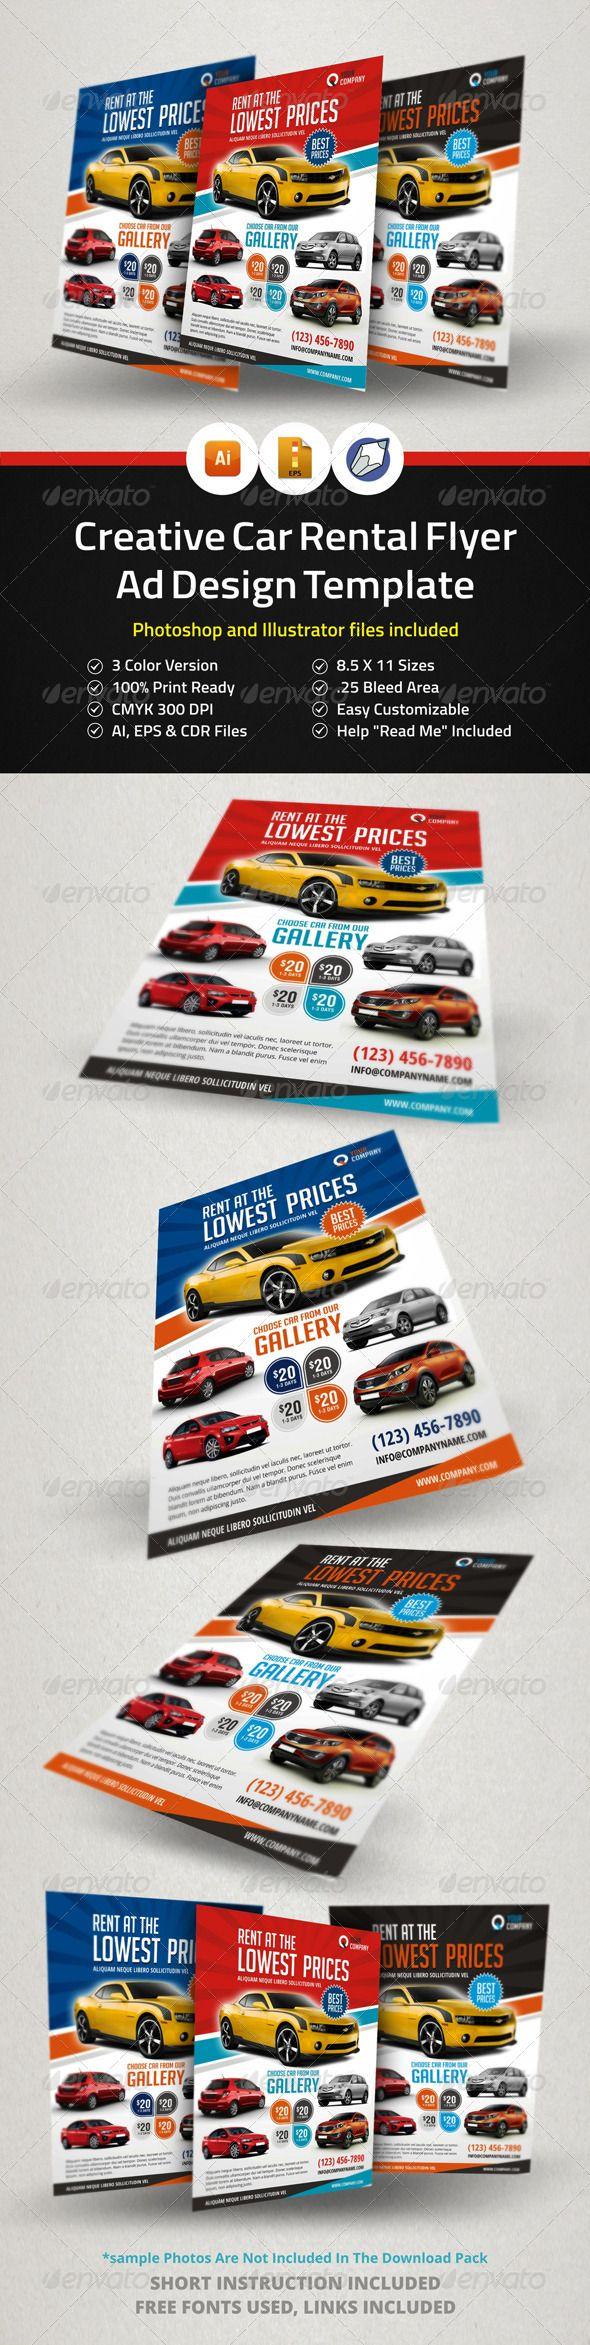 17 best images about car flyer creative promotion automotive car rental flyer ad